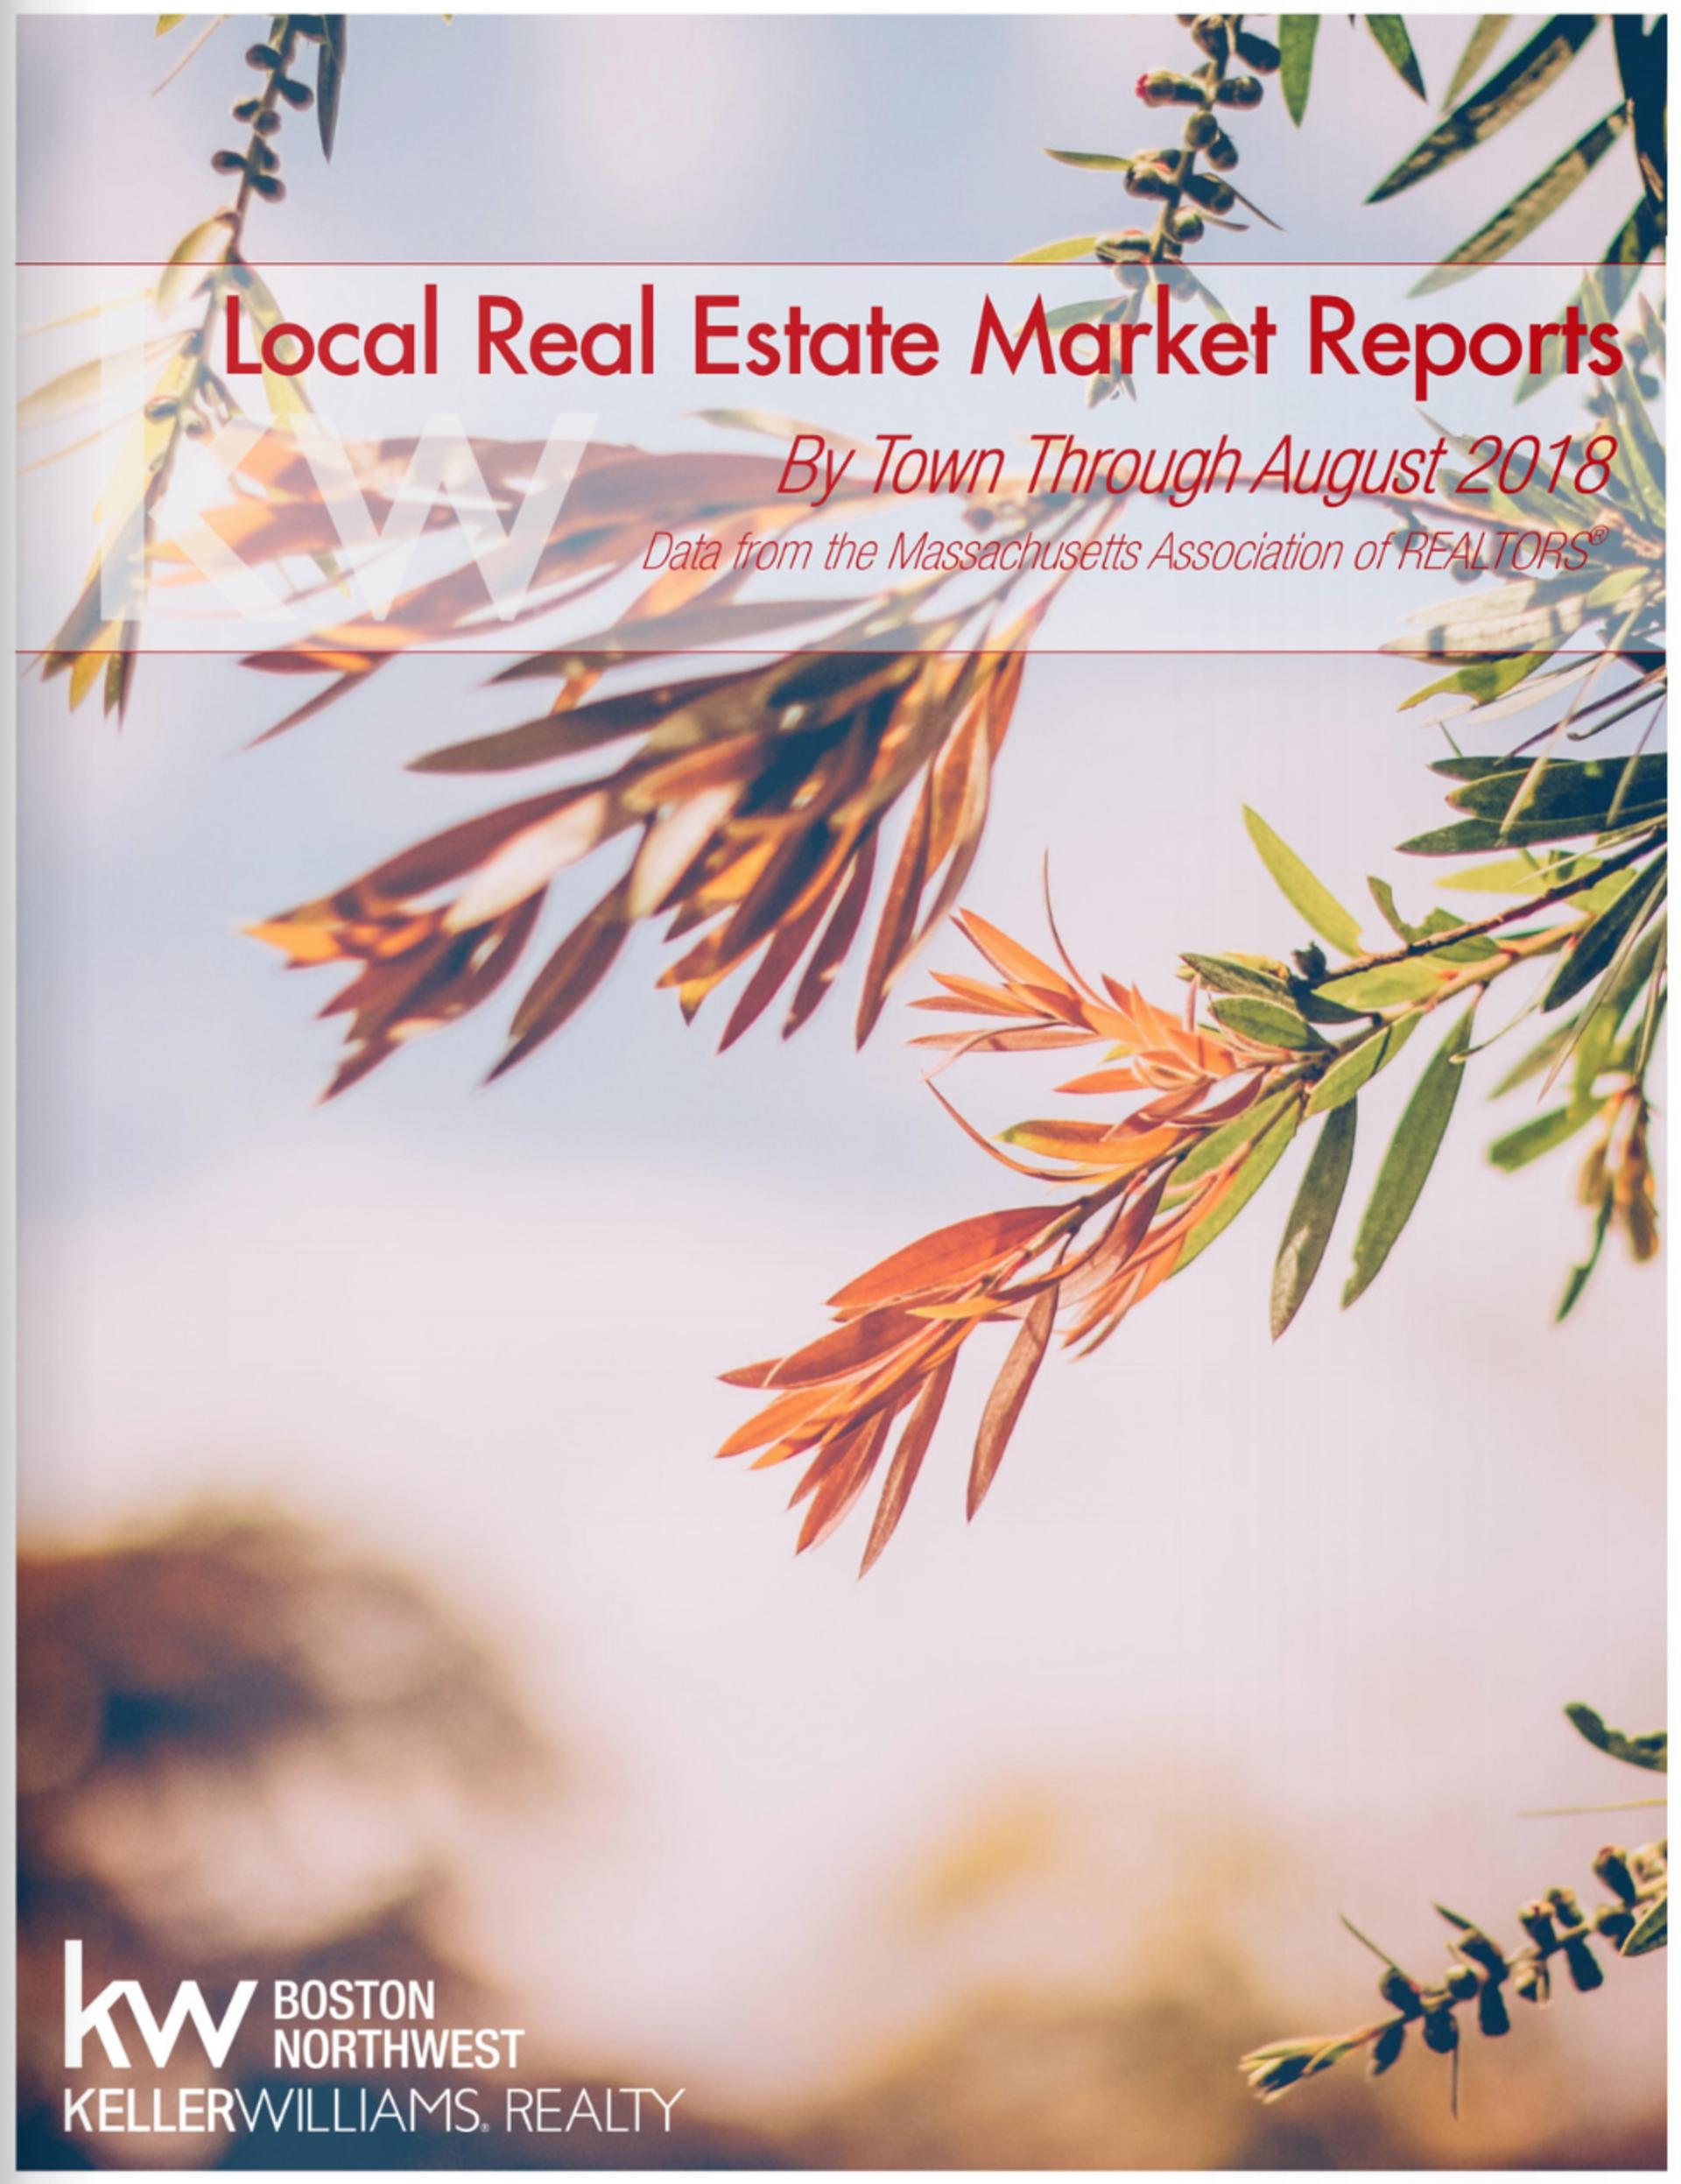 Market Report through August 2018